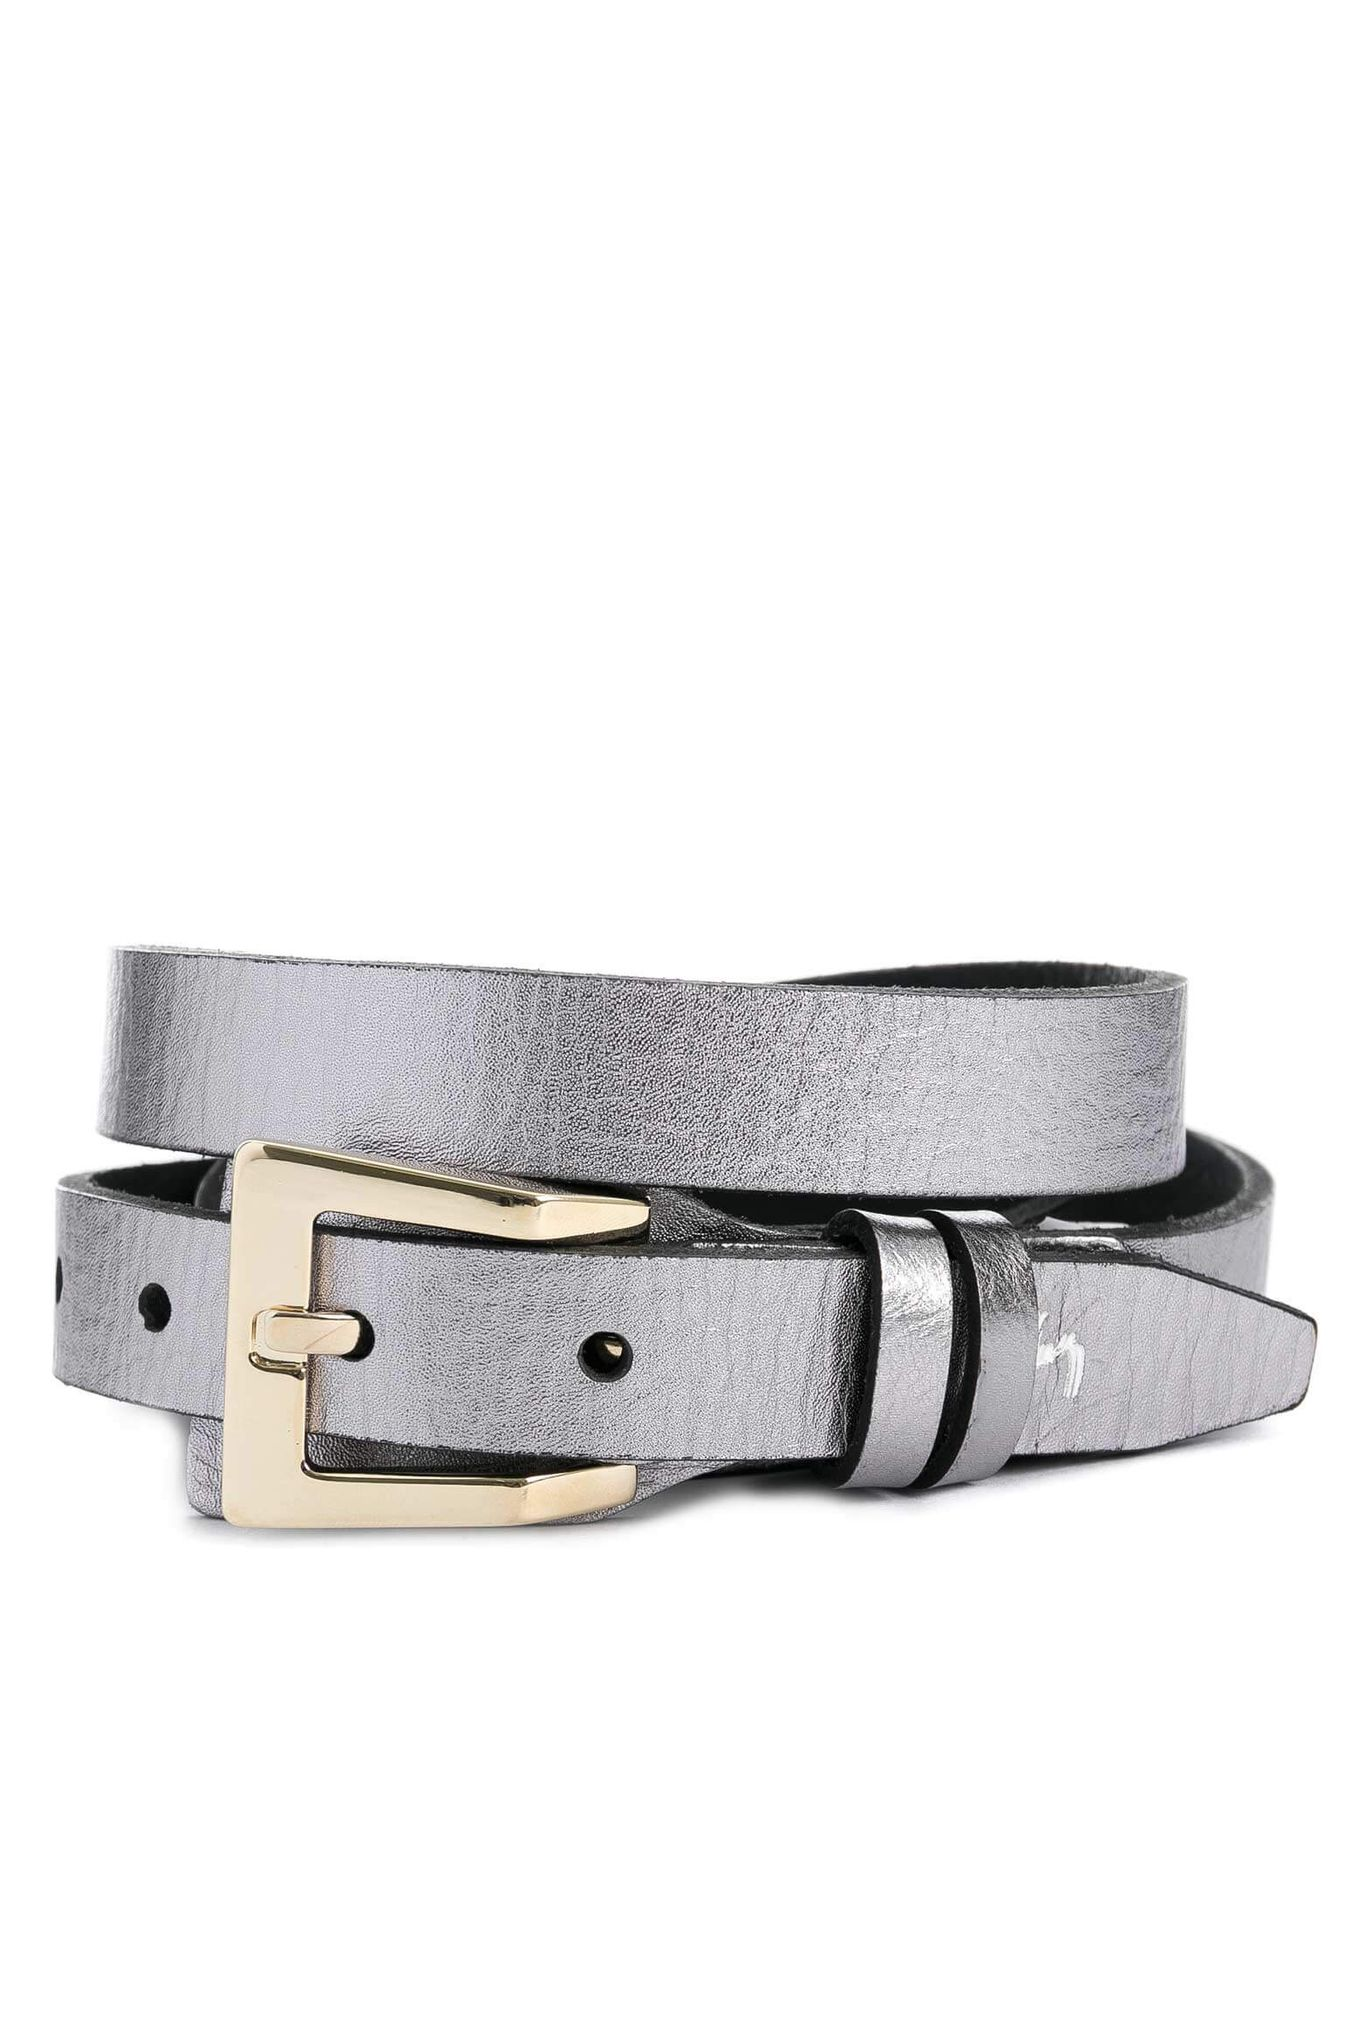 9ac0ac75a Cinturón unifaz de cuero para mujer 22267 | Unifaz | Vélez ...